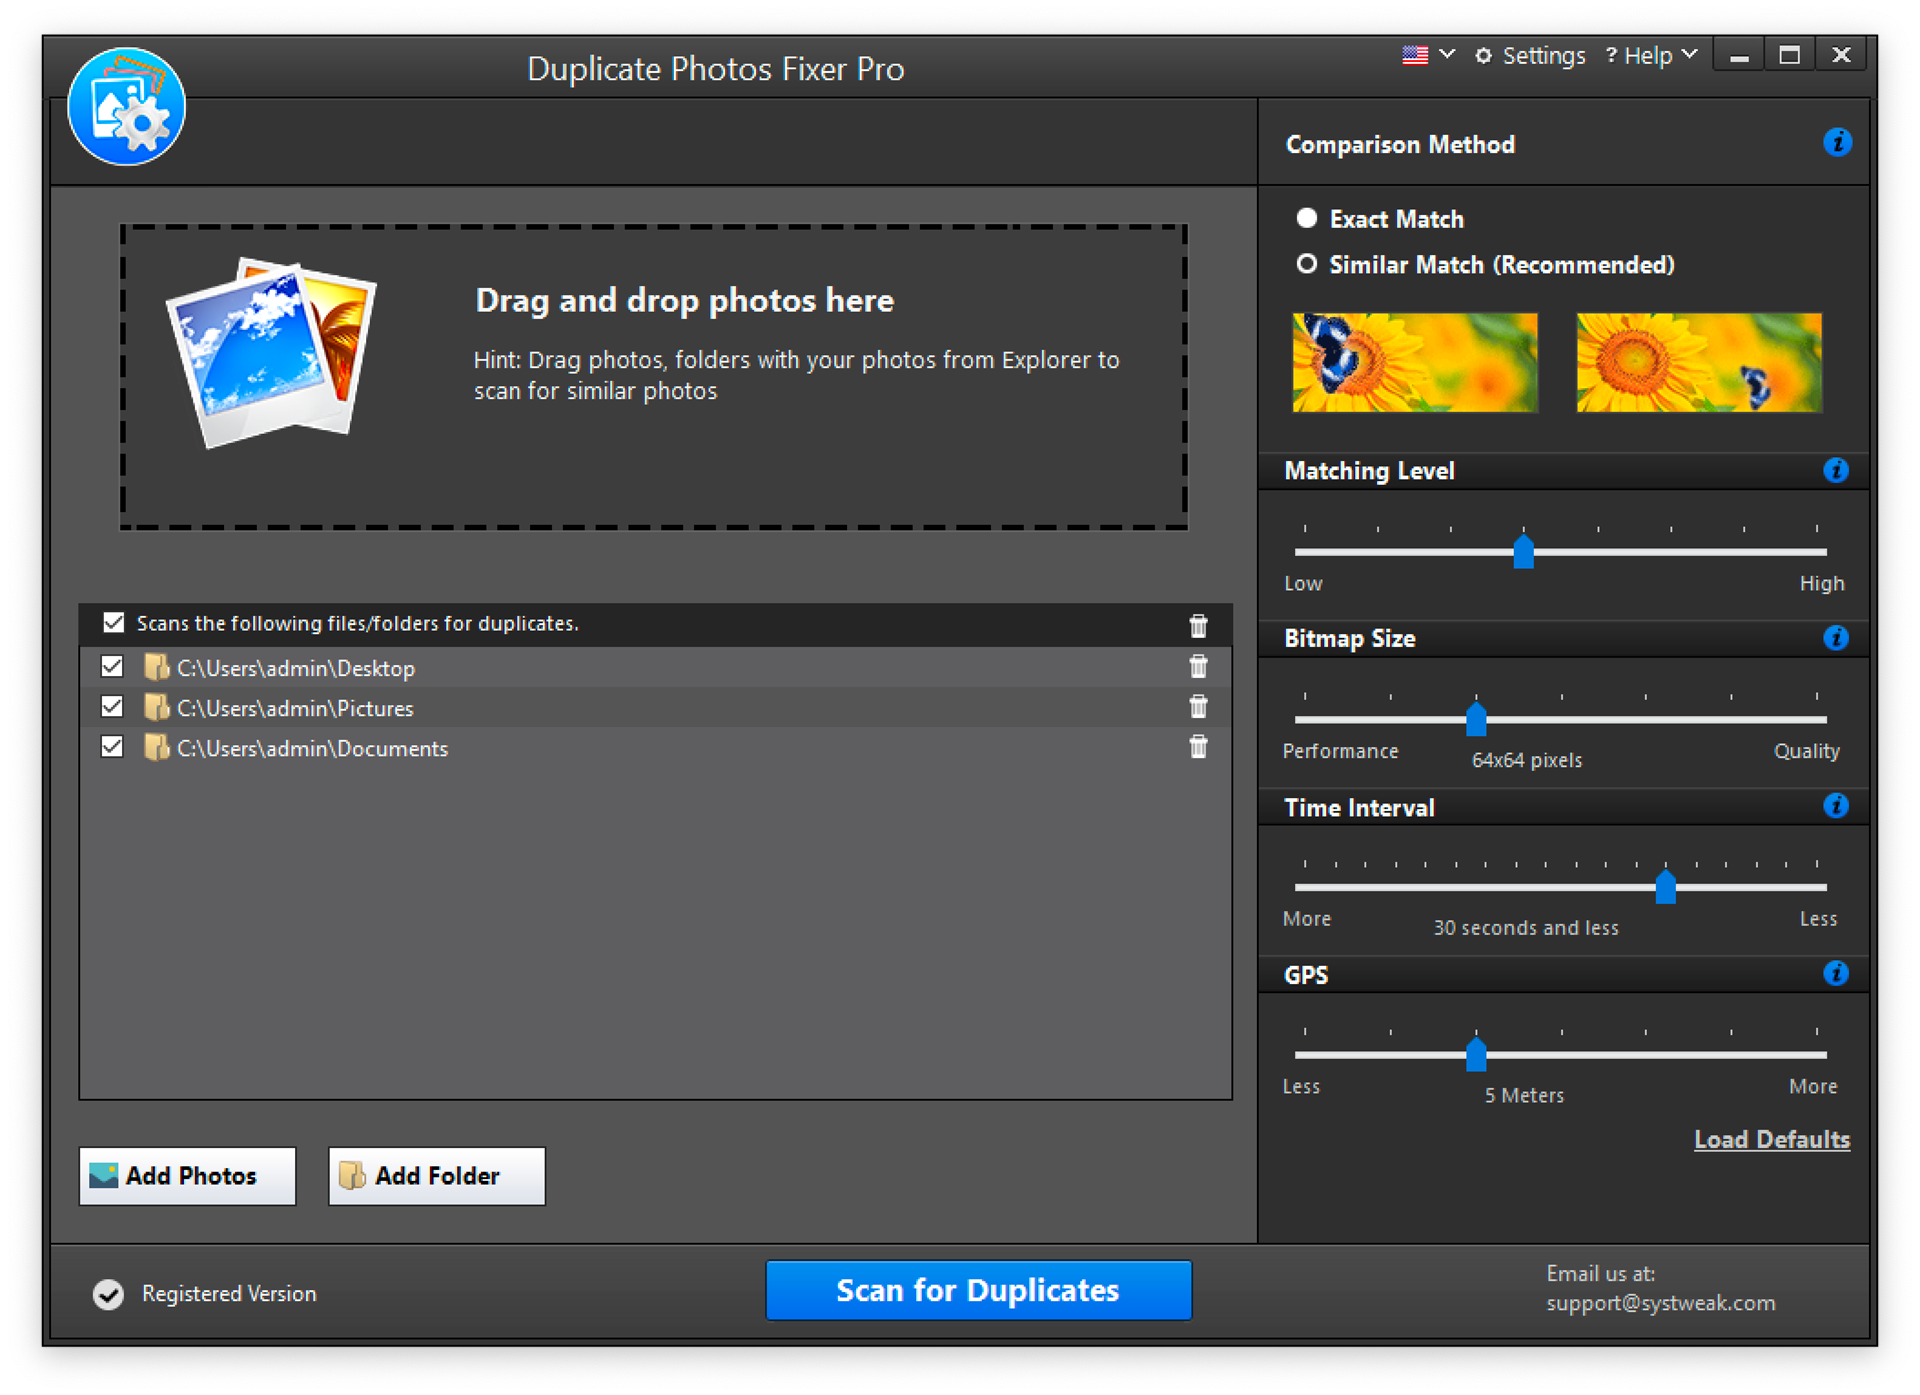 Duplicate Photos Fixer Pro Screenshot